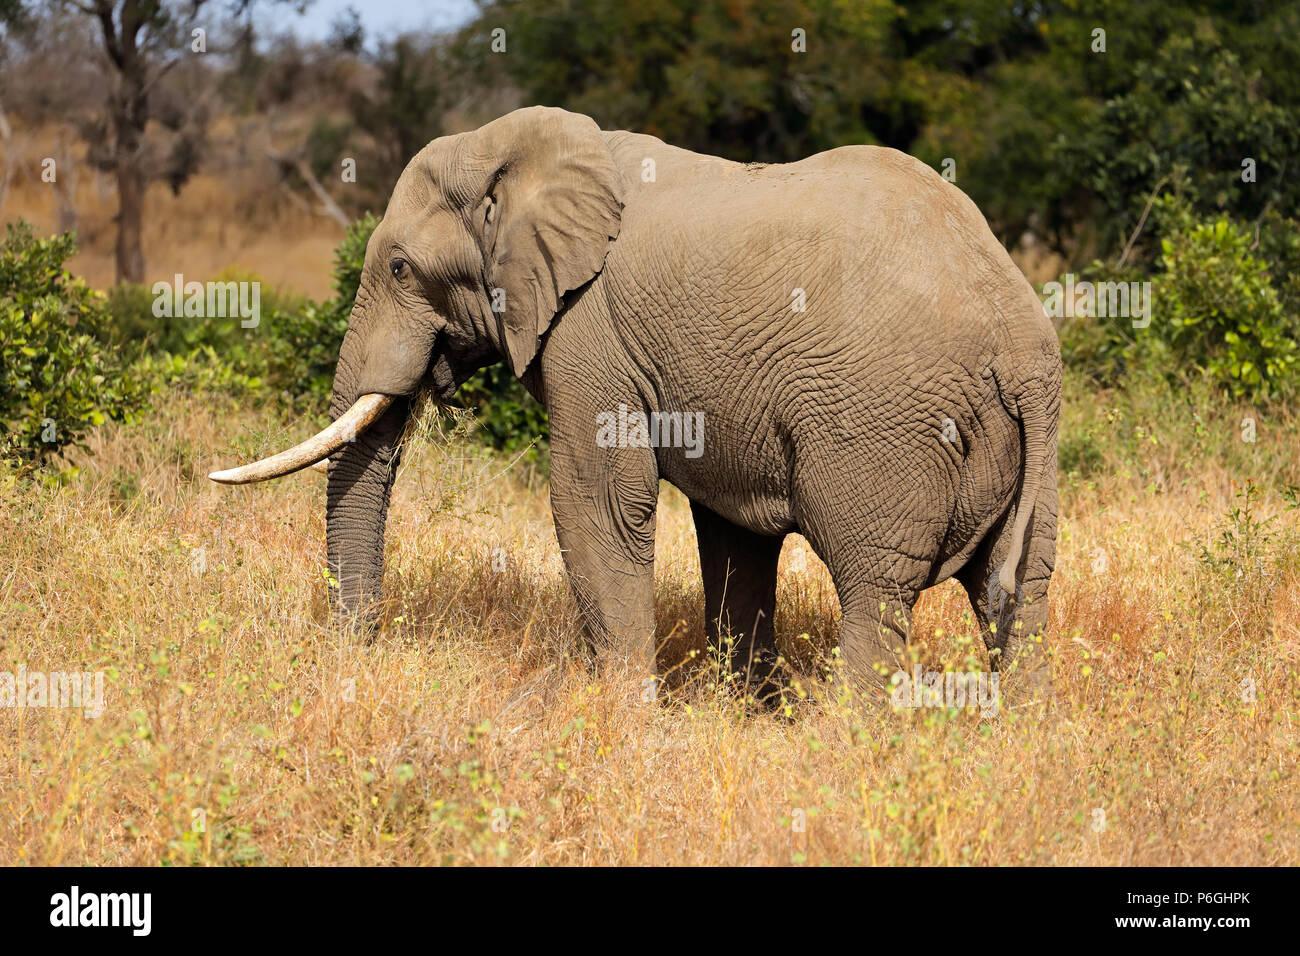 Large African bull elephant (Loxodonta africana), Kruger National Park, South Africa Stock Photo